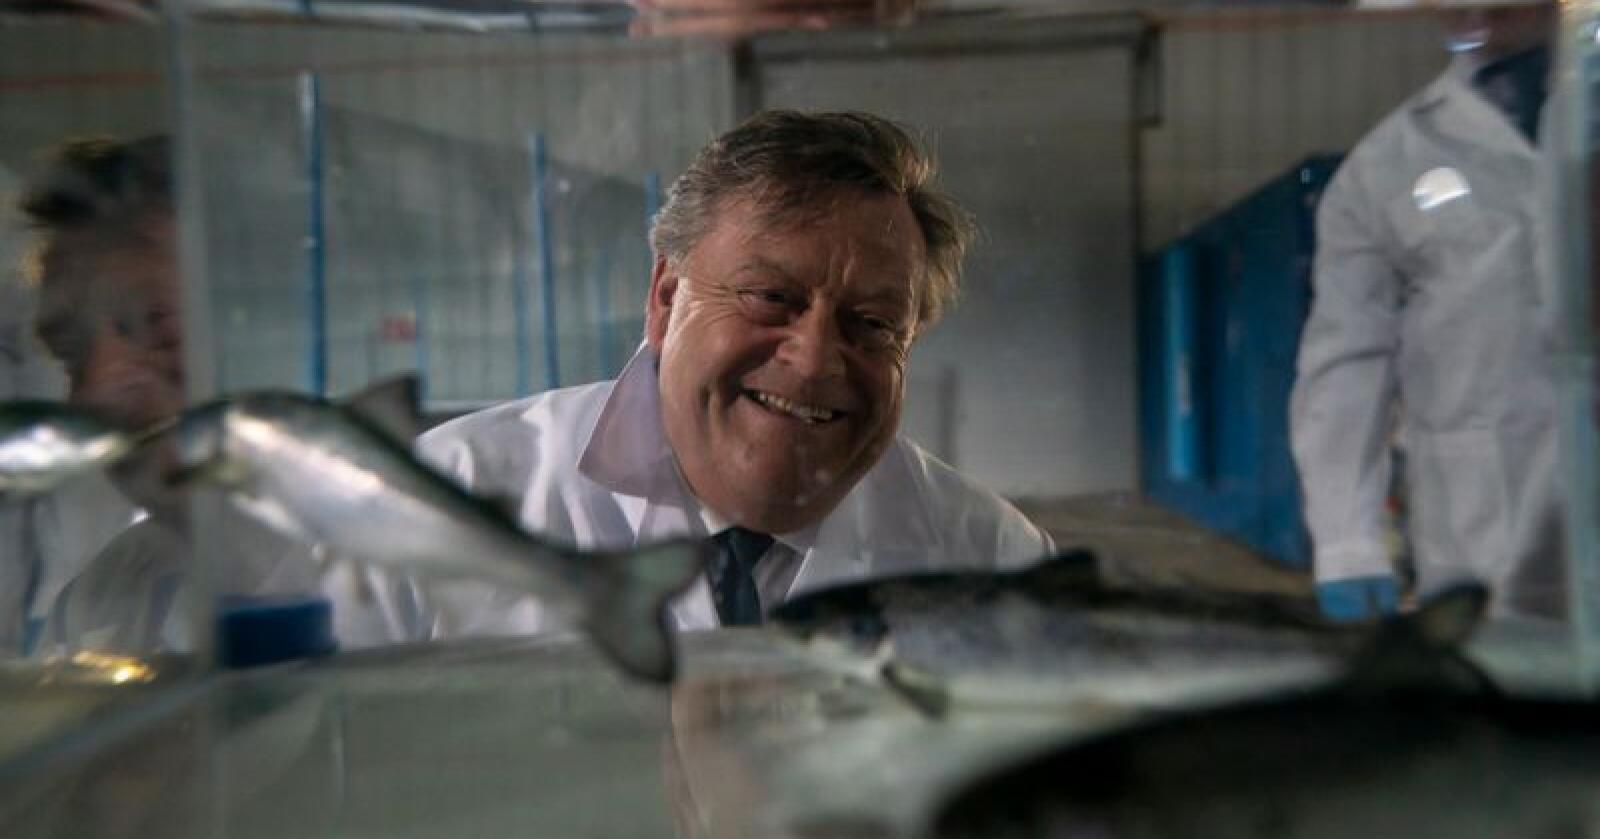 Fiskeriminister Harald T. Nesvik er svært fornøyd med utviklingen i norsk sjømatnæring. Foto: Heiko Junge / NTB scanpix